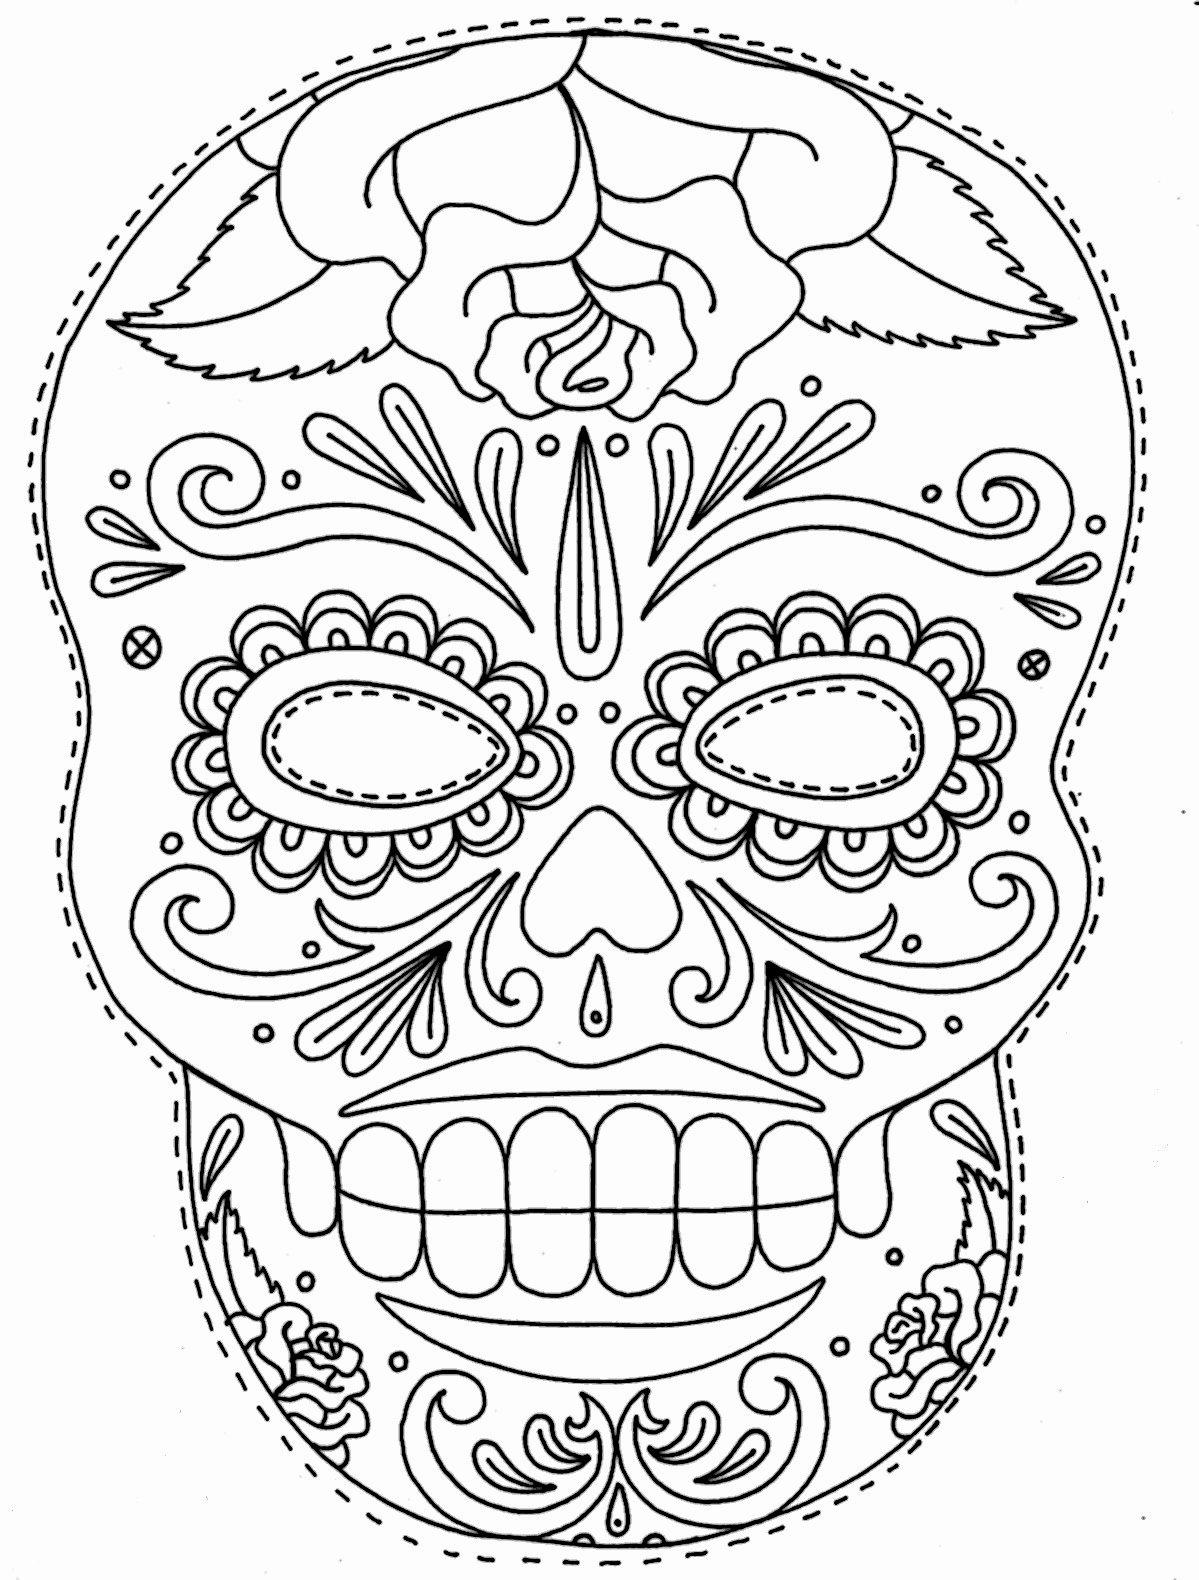 Blank Sugar Skull Template Luxury Tattoos Book 2510 Free Printable Tattoo Stencils Skulls